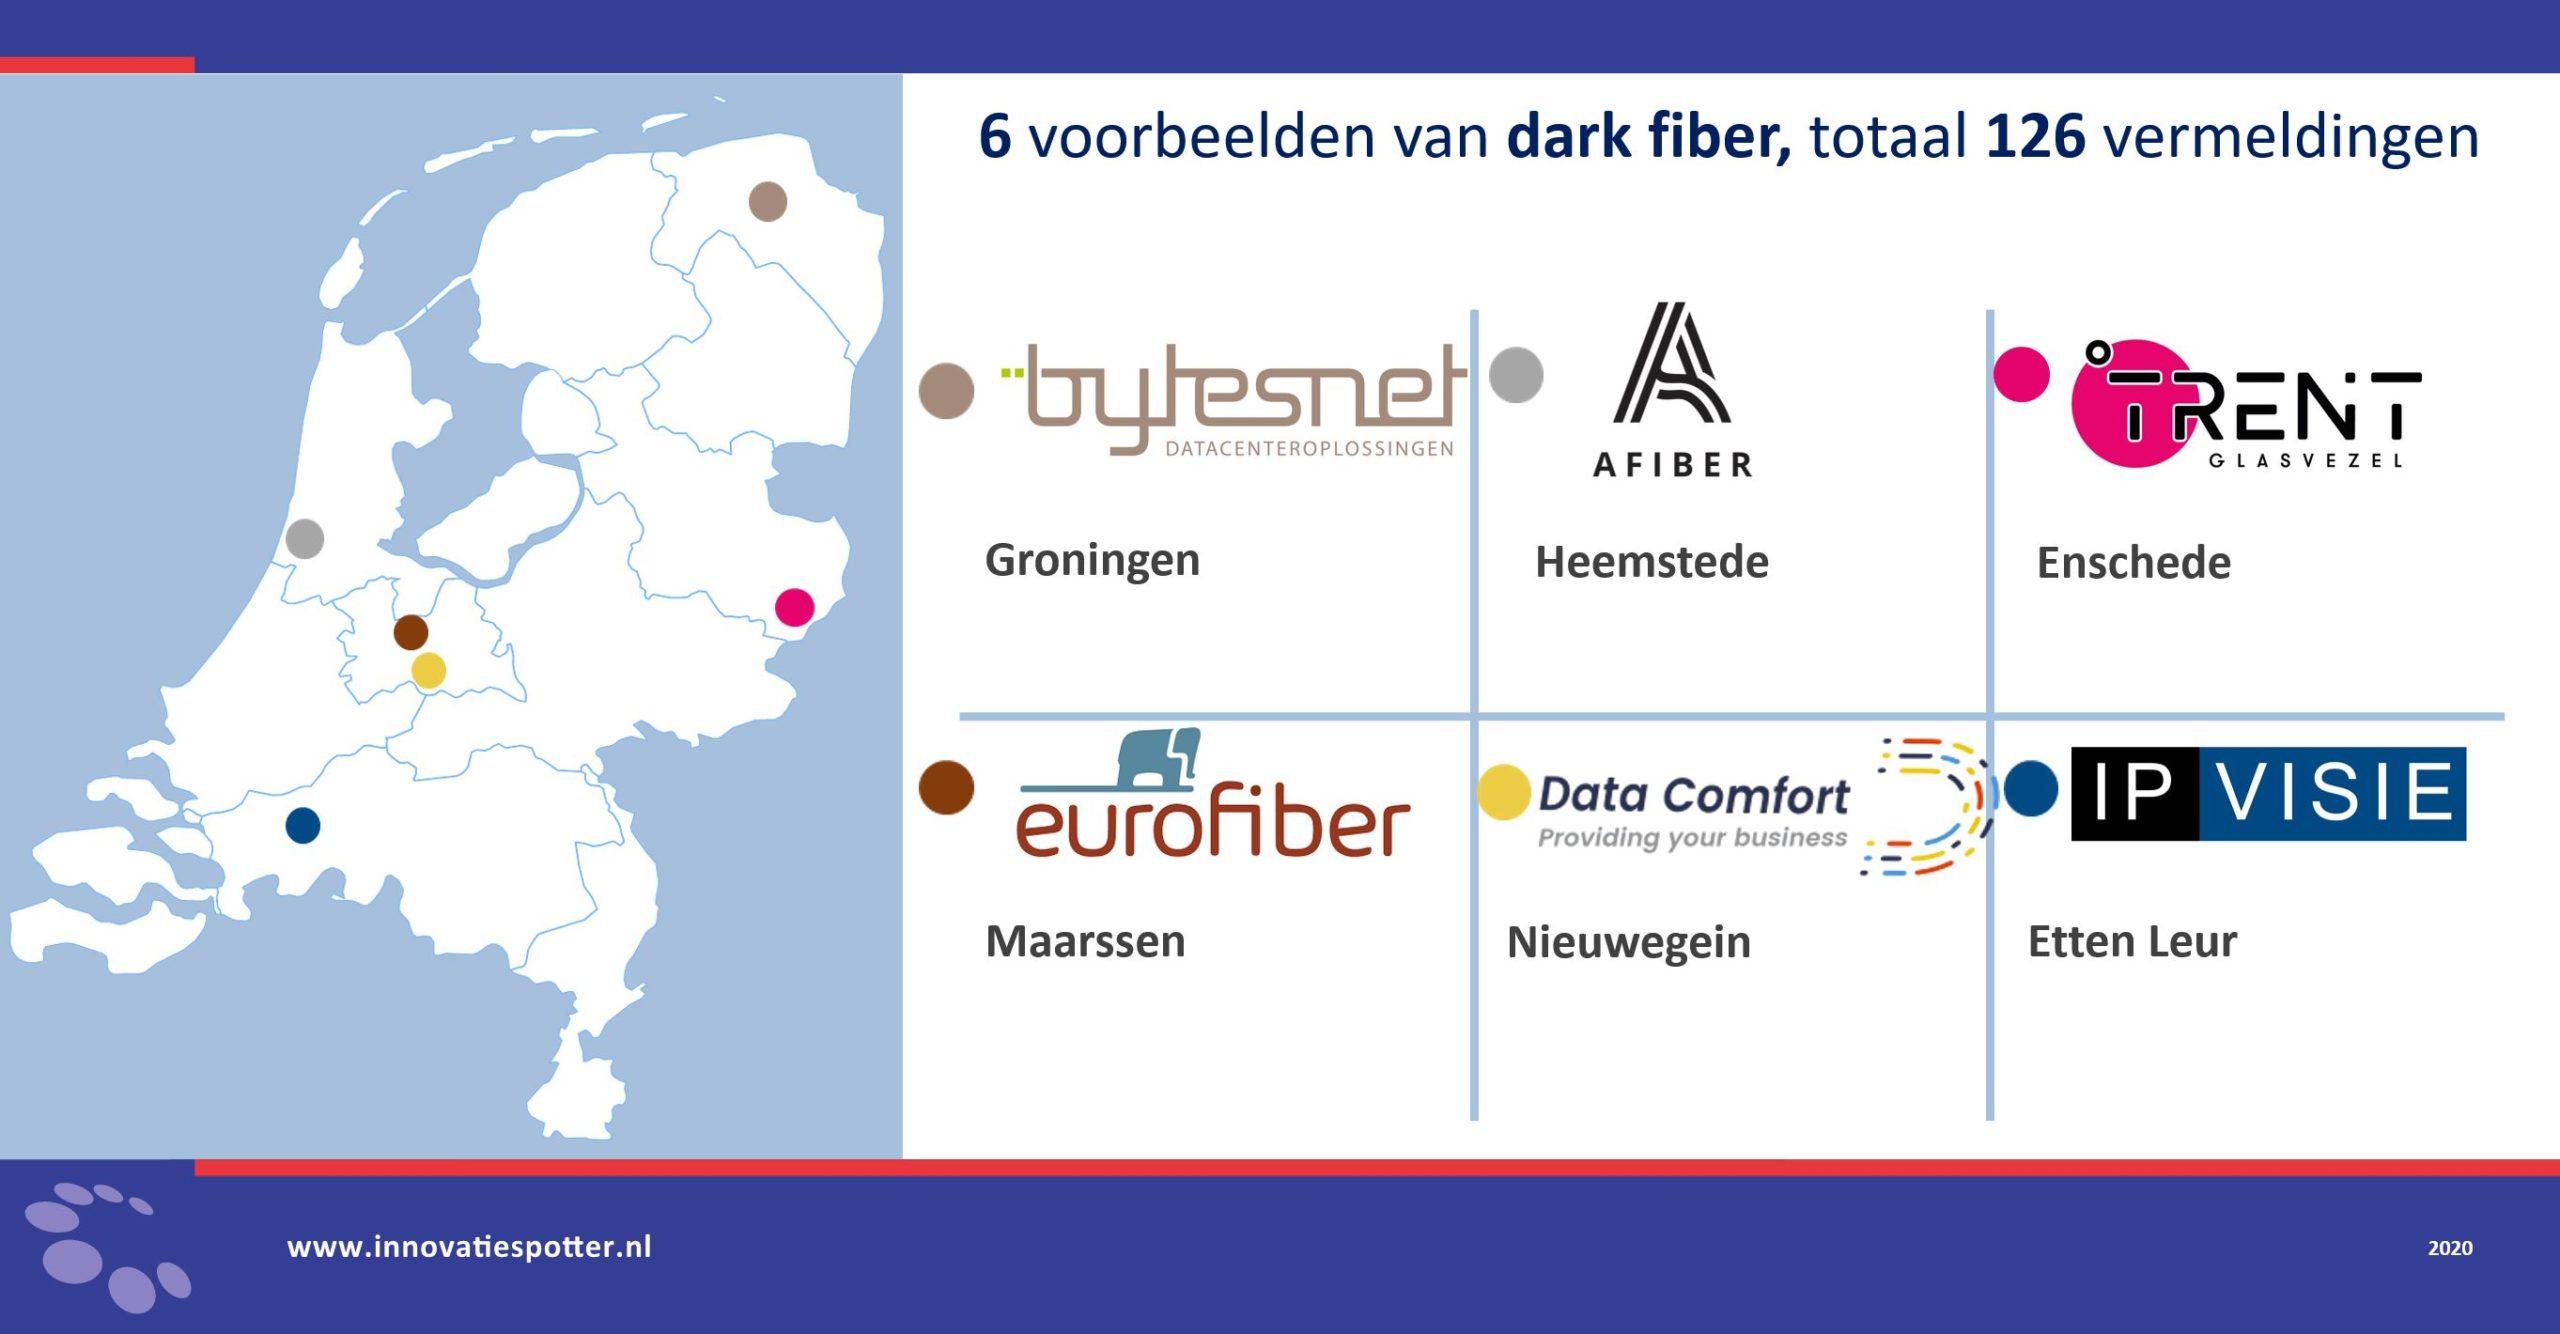 Opkomst van dark fiber in Nederland